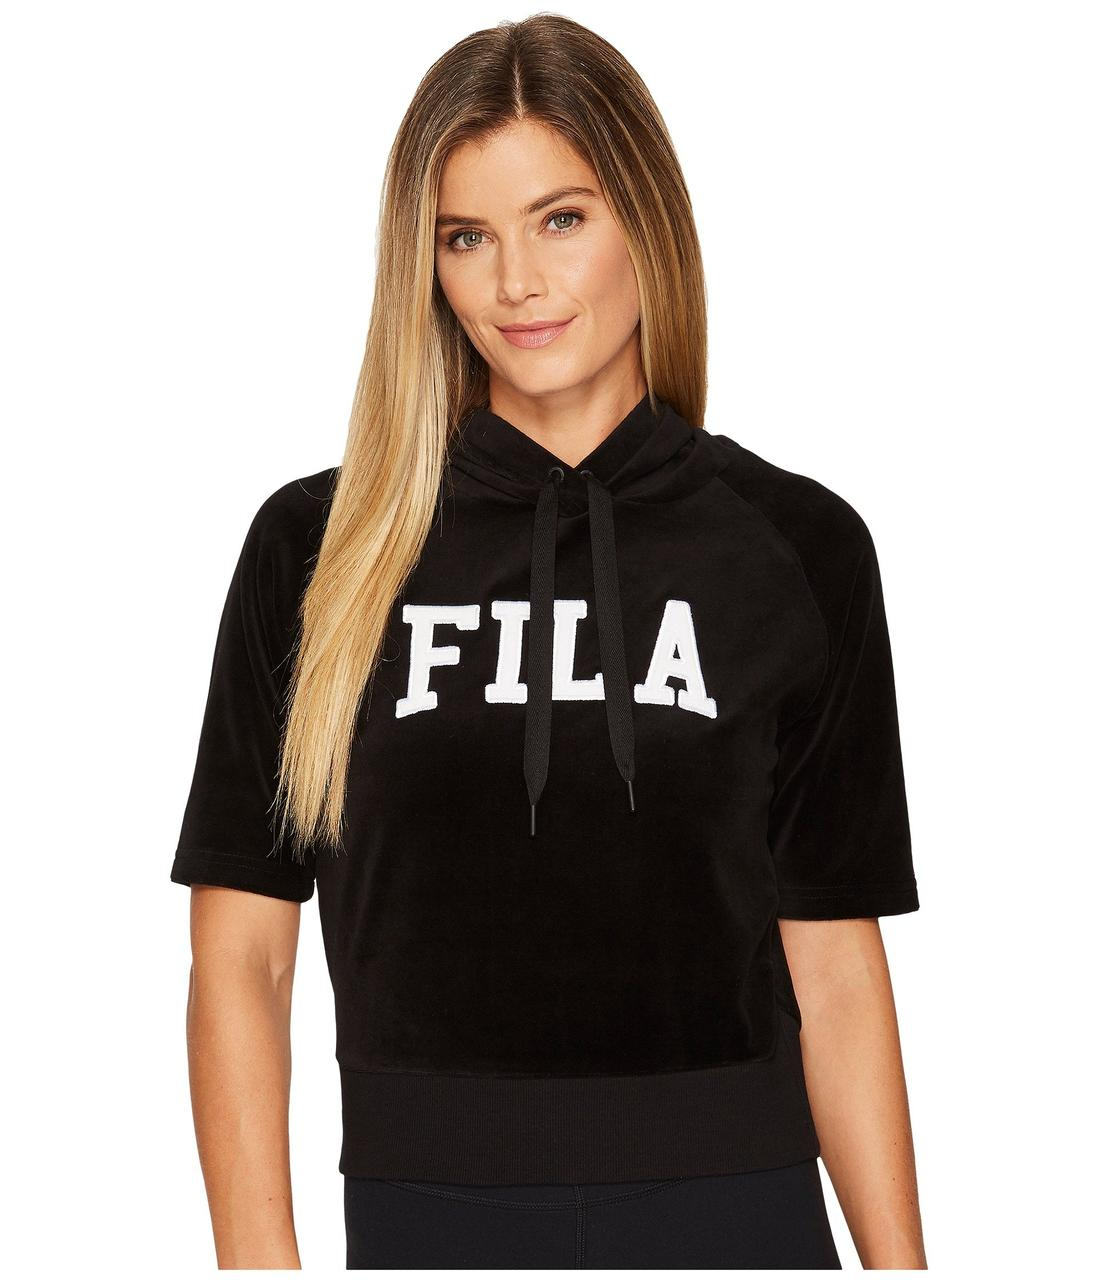 68ed76ab Толстовка Fila Ariana Short Sleeve Hoodie Black - Оригинал - FAIR -  оригинальная одежда и обувь